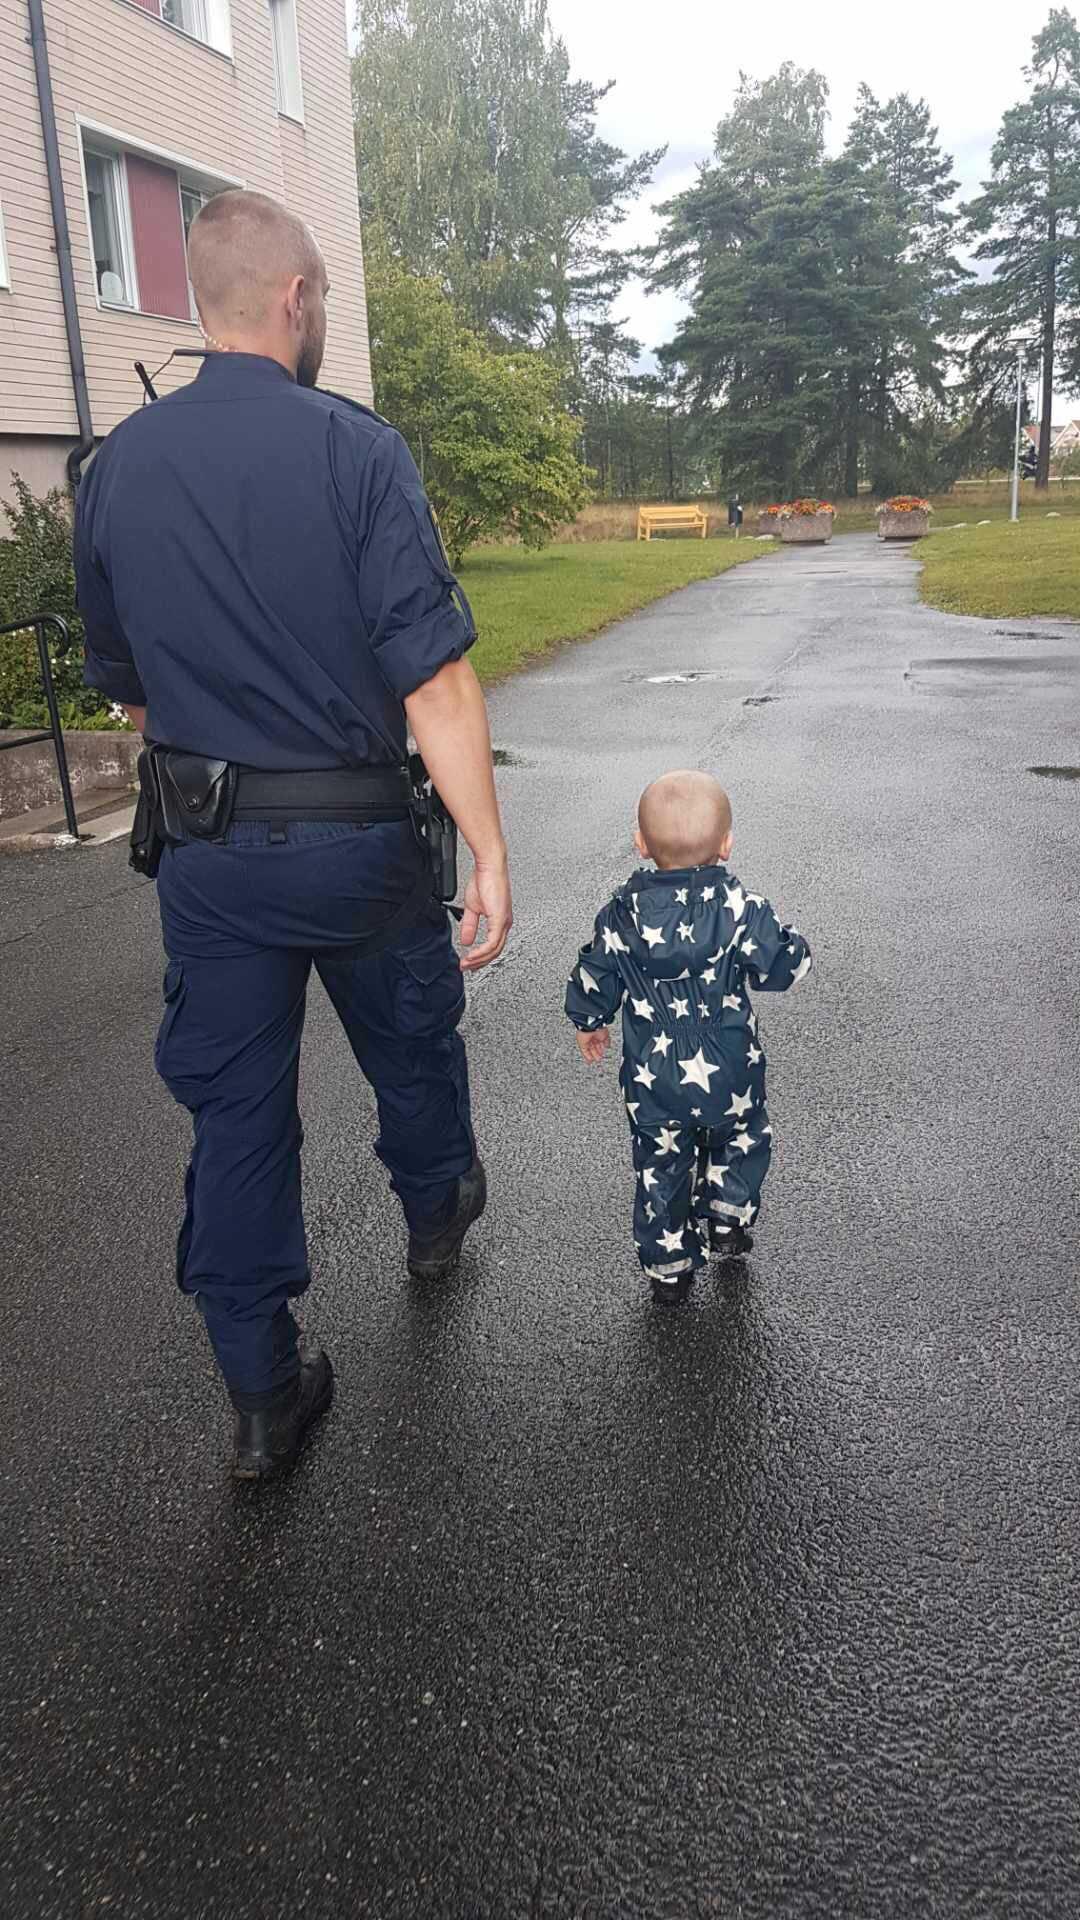 Polisen tog uppdraget på stort allvar.